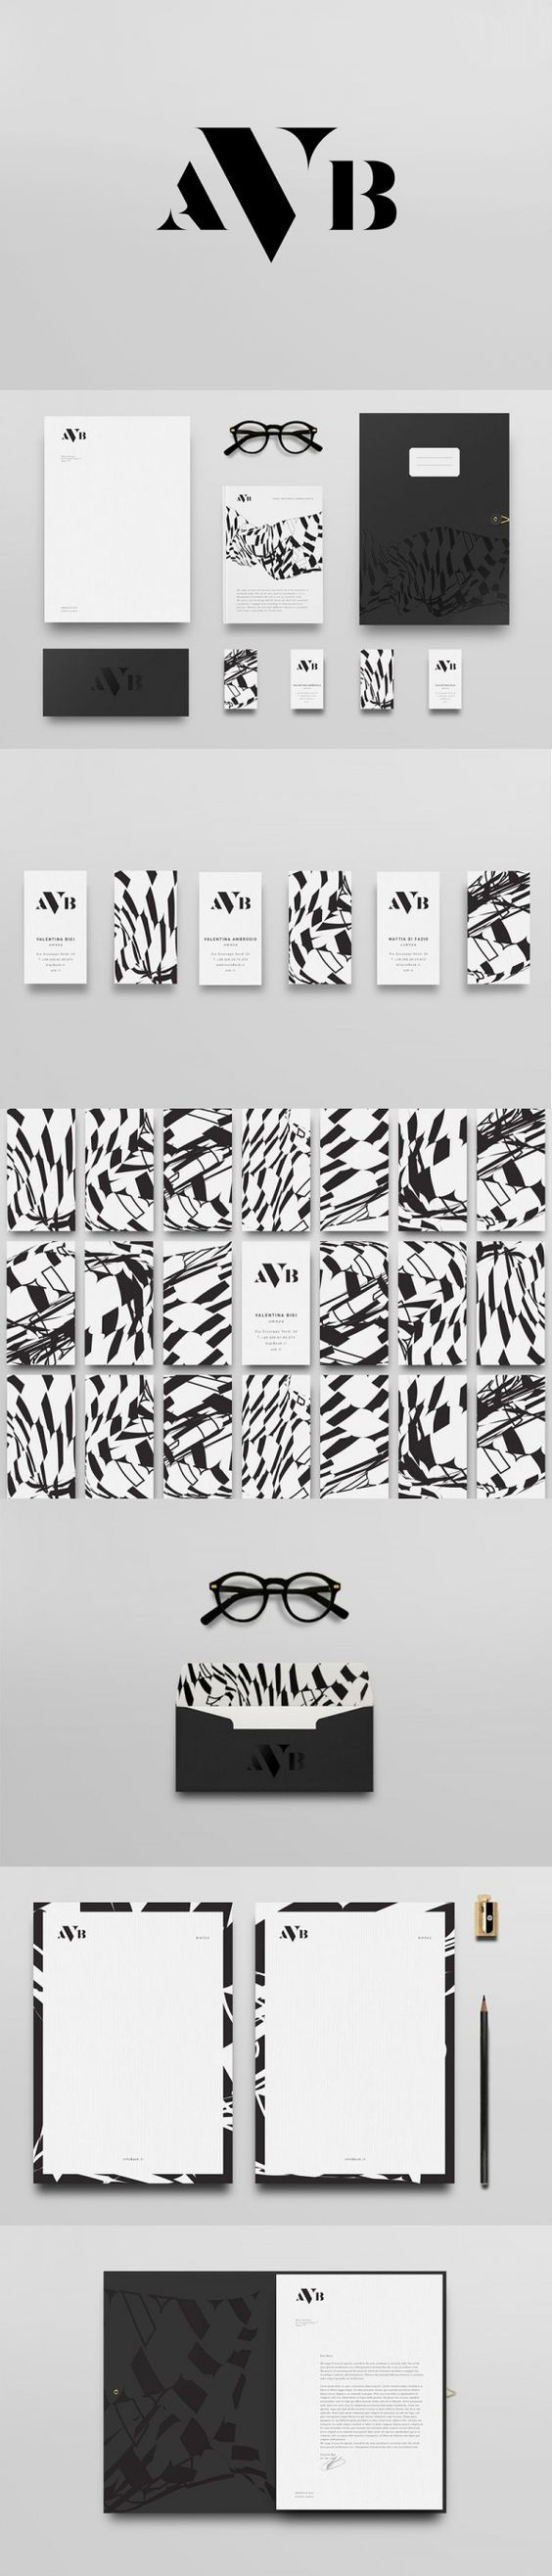 AVB Law Firm Branding by Studio Whiskey & Mentine | Fivestar Branding – Design and Branding Agency & Inspiration Gallery